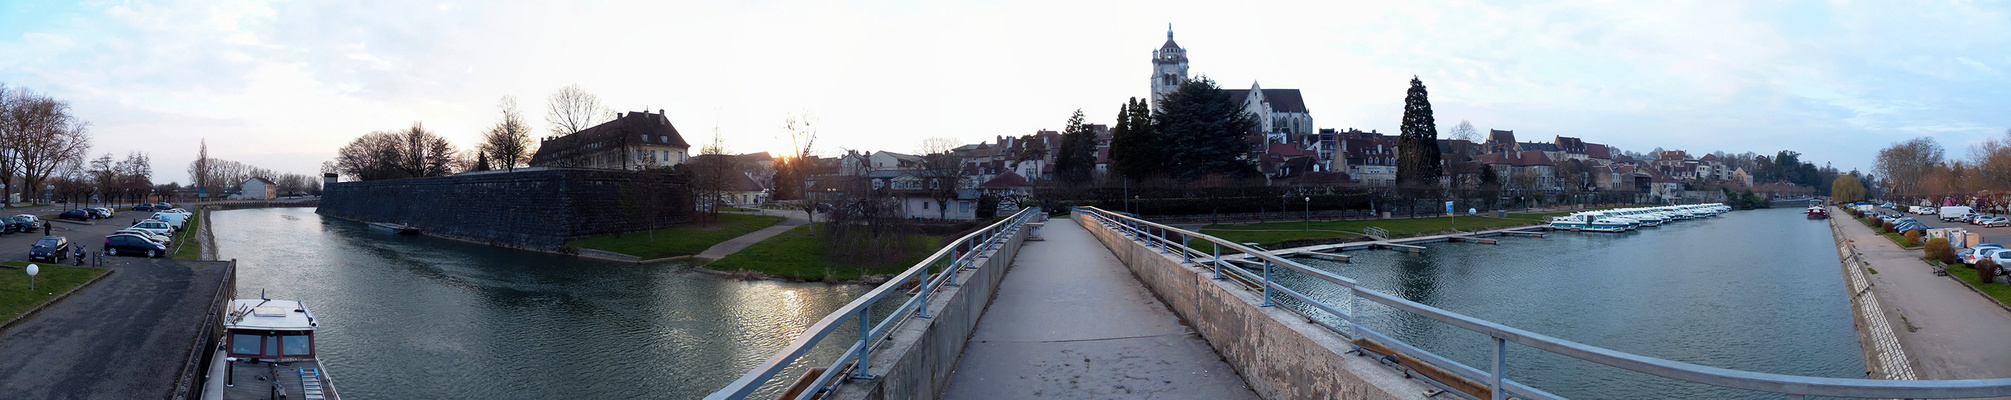 le canal Rhin Rhône a Dole - Jura